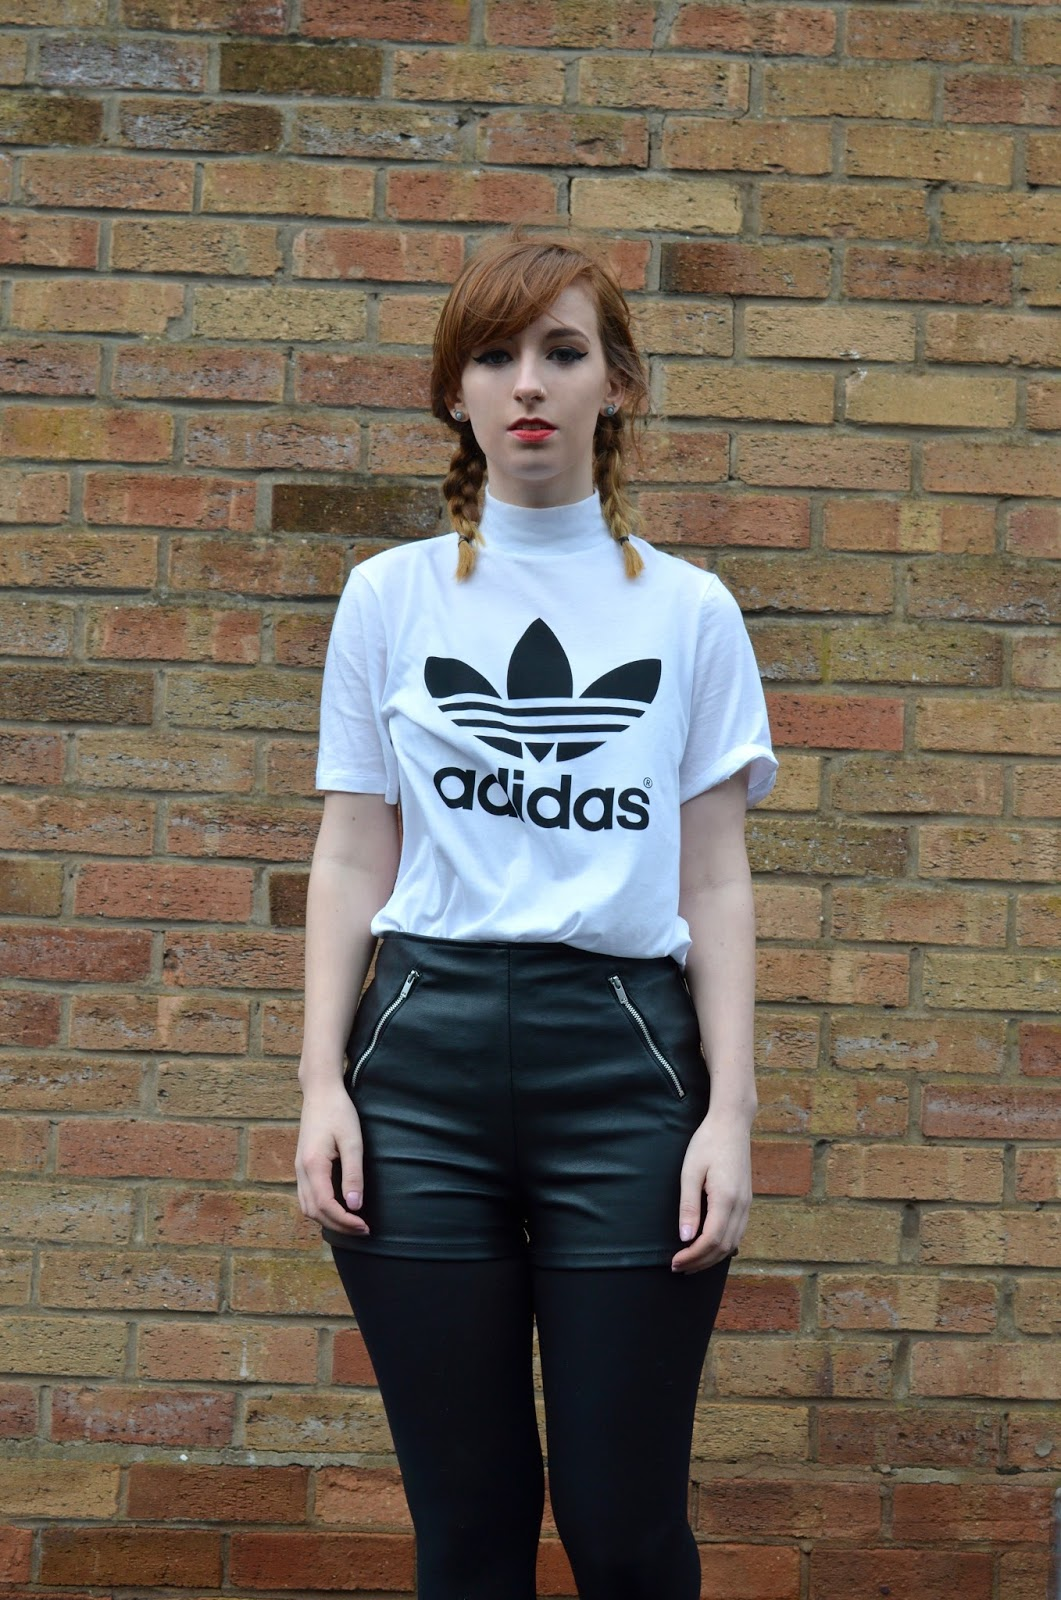 Street Style wearing Adidas